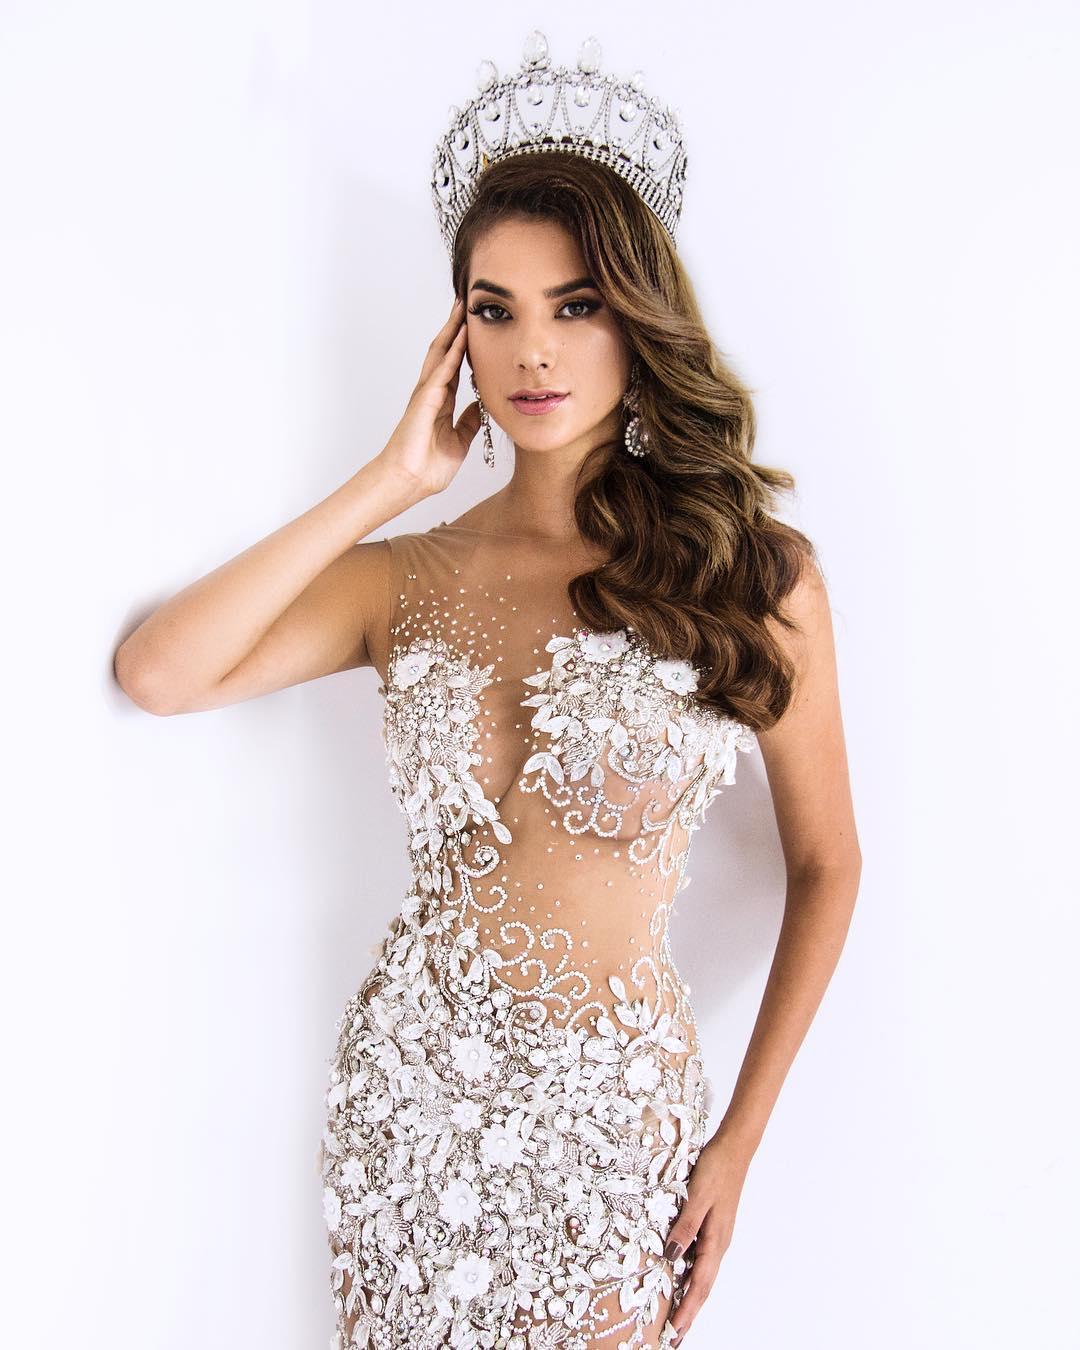 suheyn cipriani, miss eco international 2019. 51604312